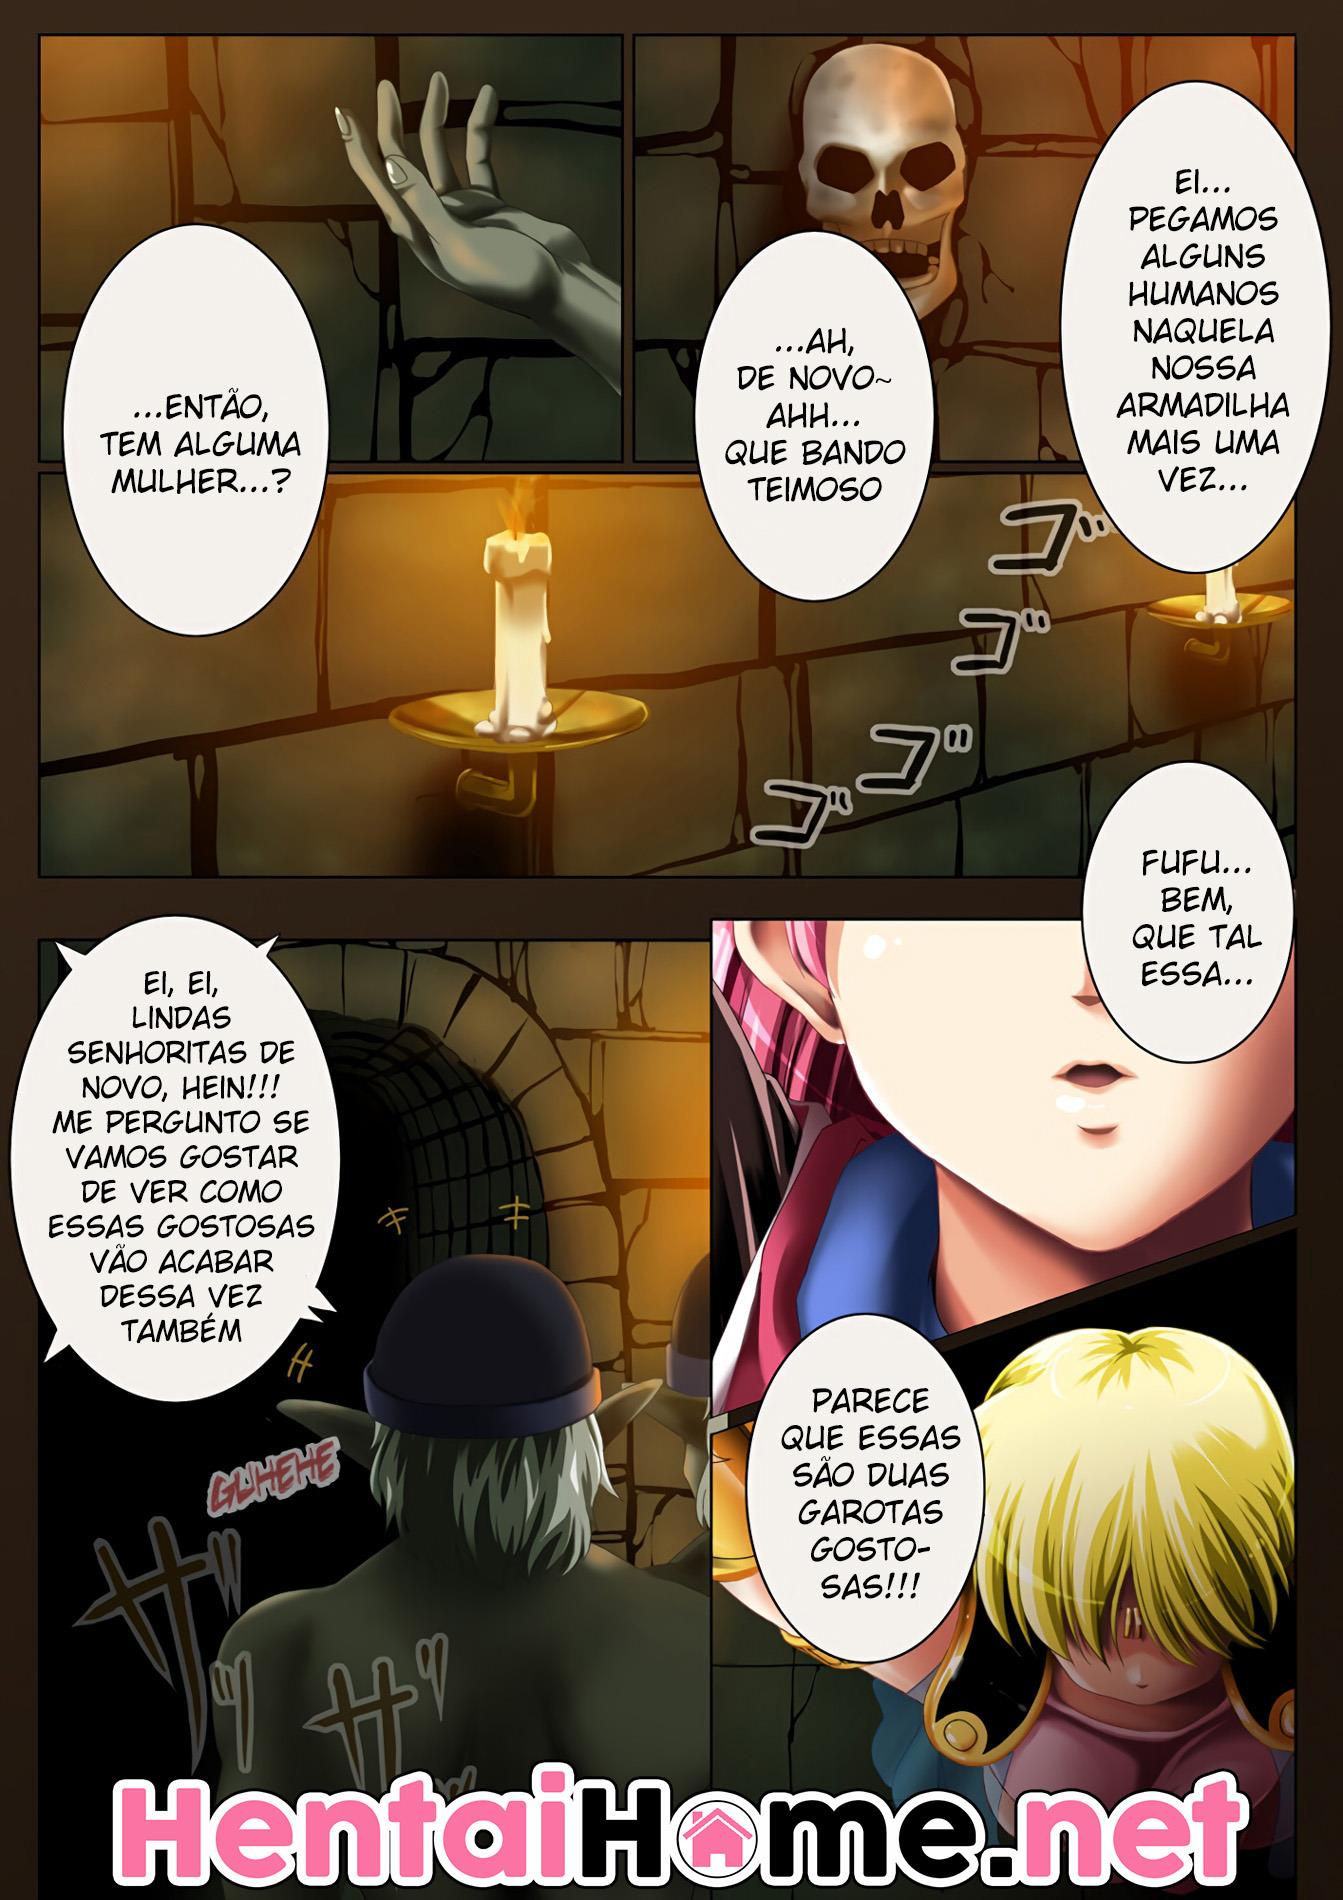 Dragon Quest: Dai no Daiboken Hentai - O prazer de Maan - Foto 3